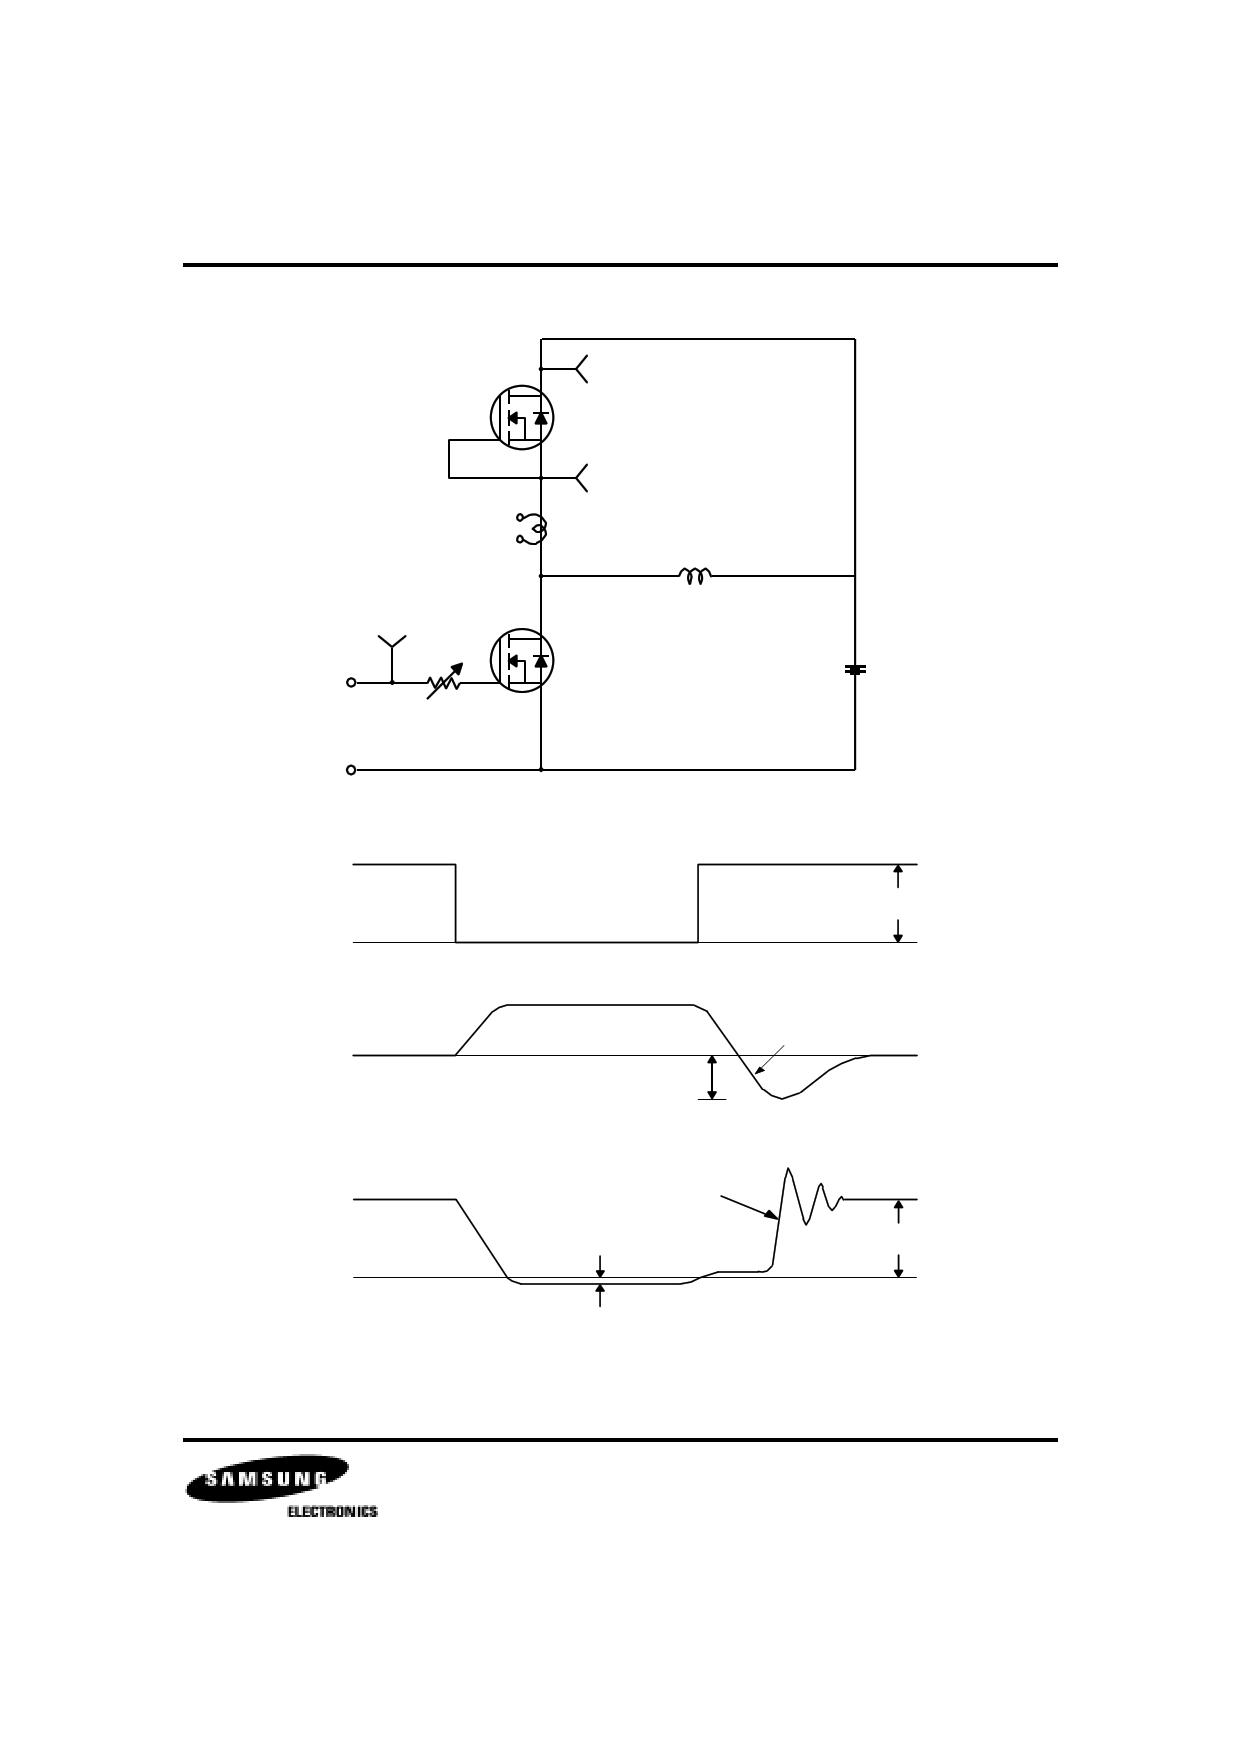 IRFZ44A 電子部品, 半導体